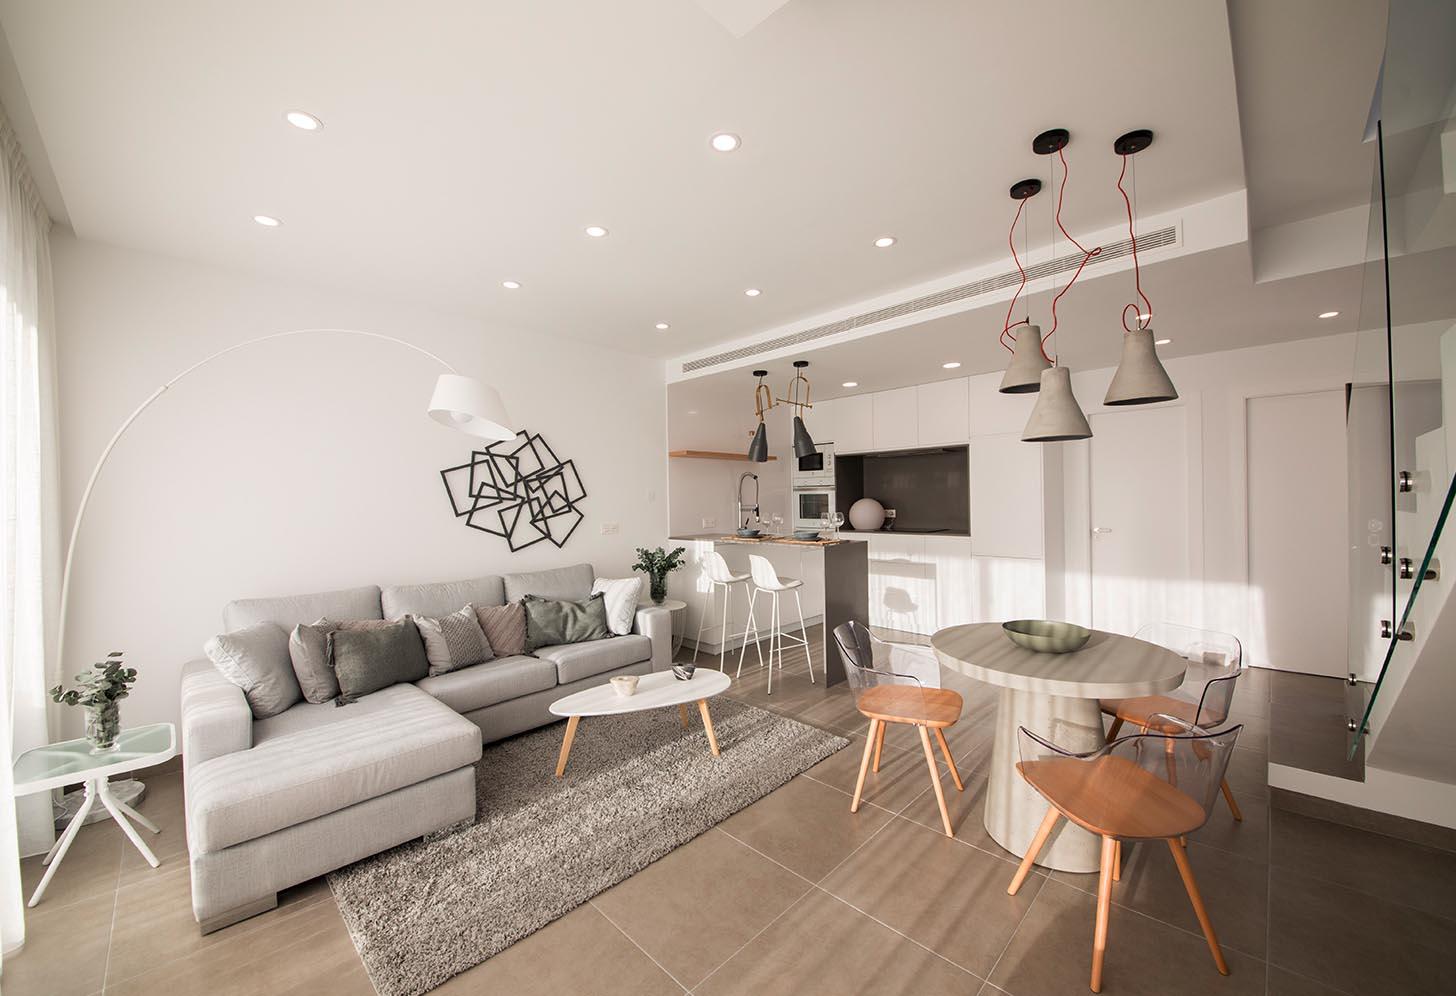 immobilier neuf espagne costa blanca sur murcia salon 2